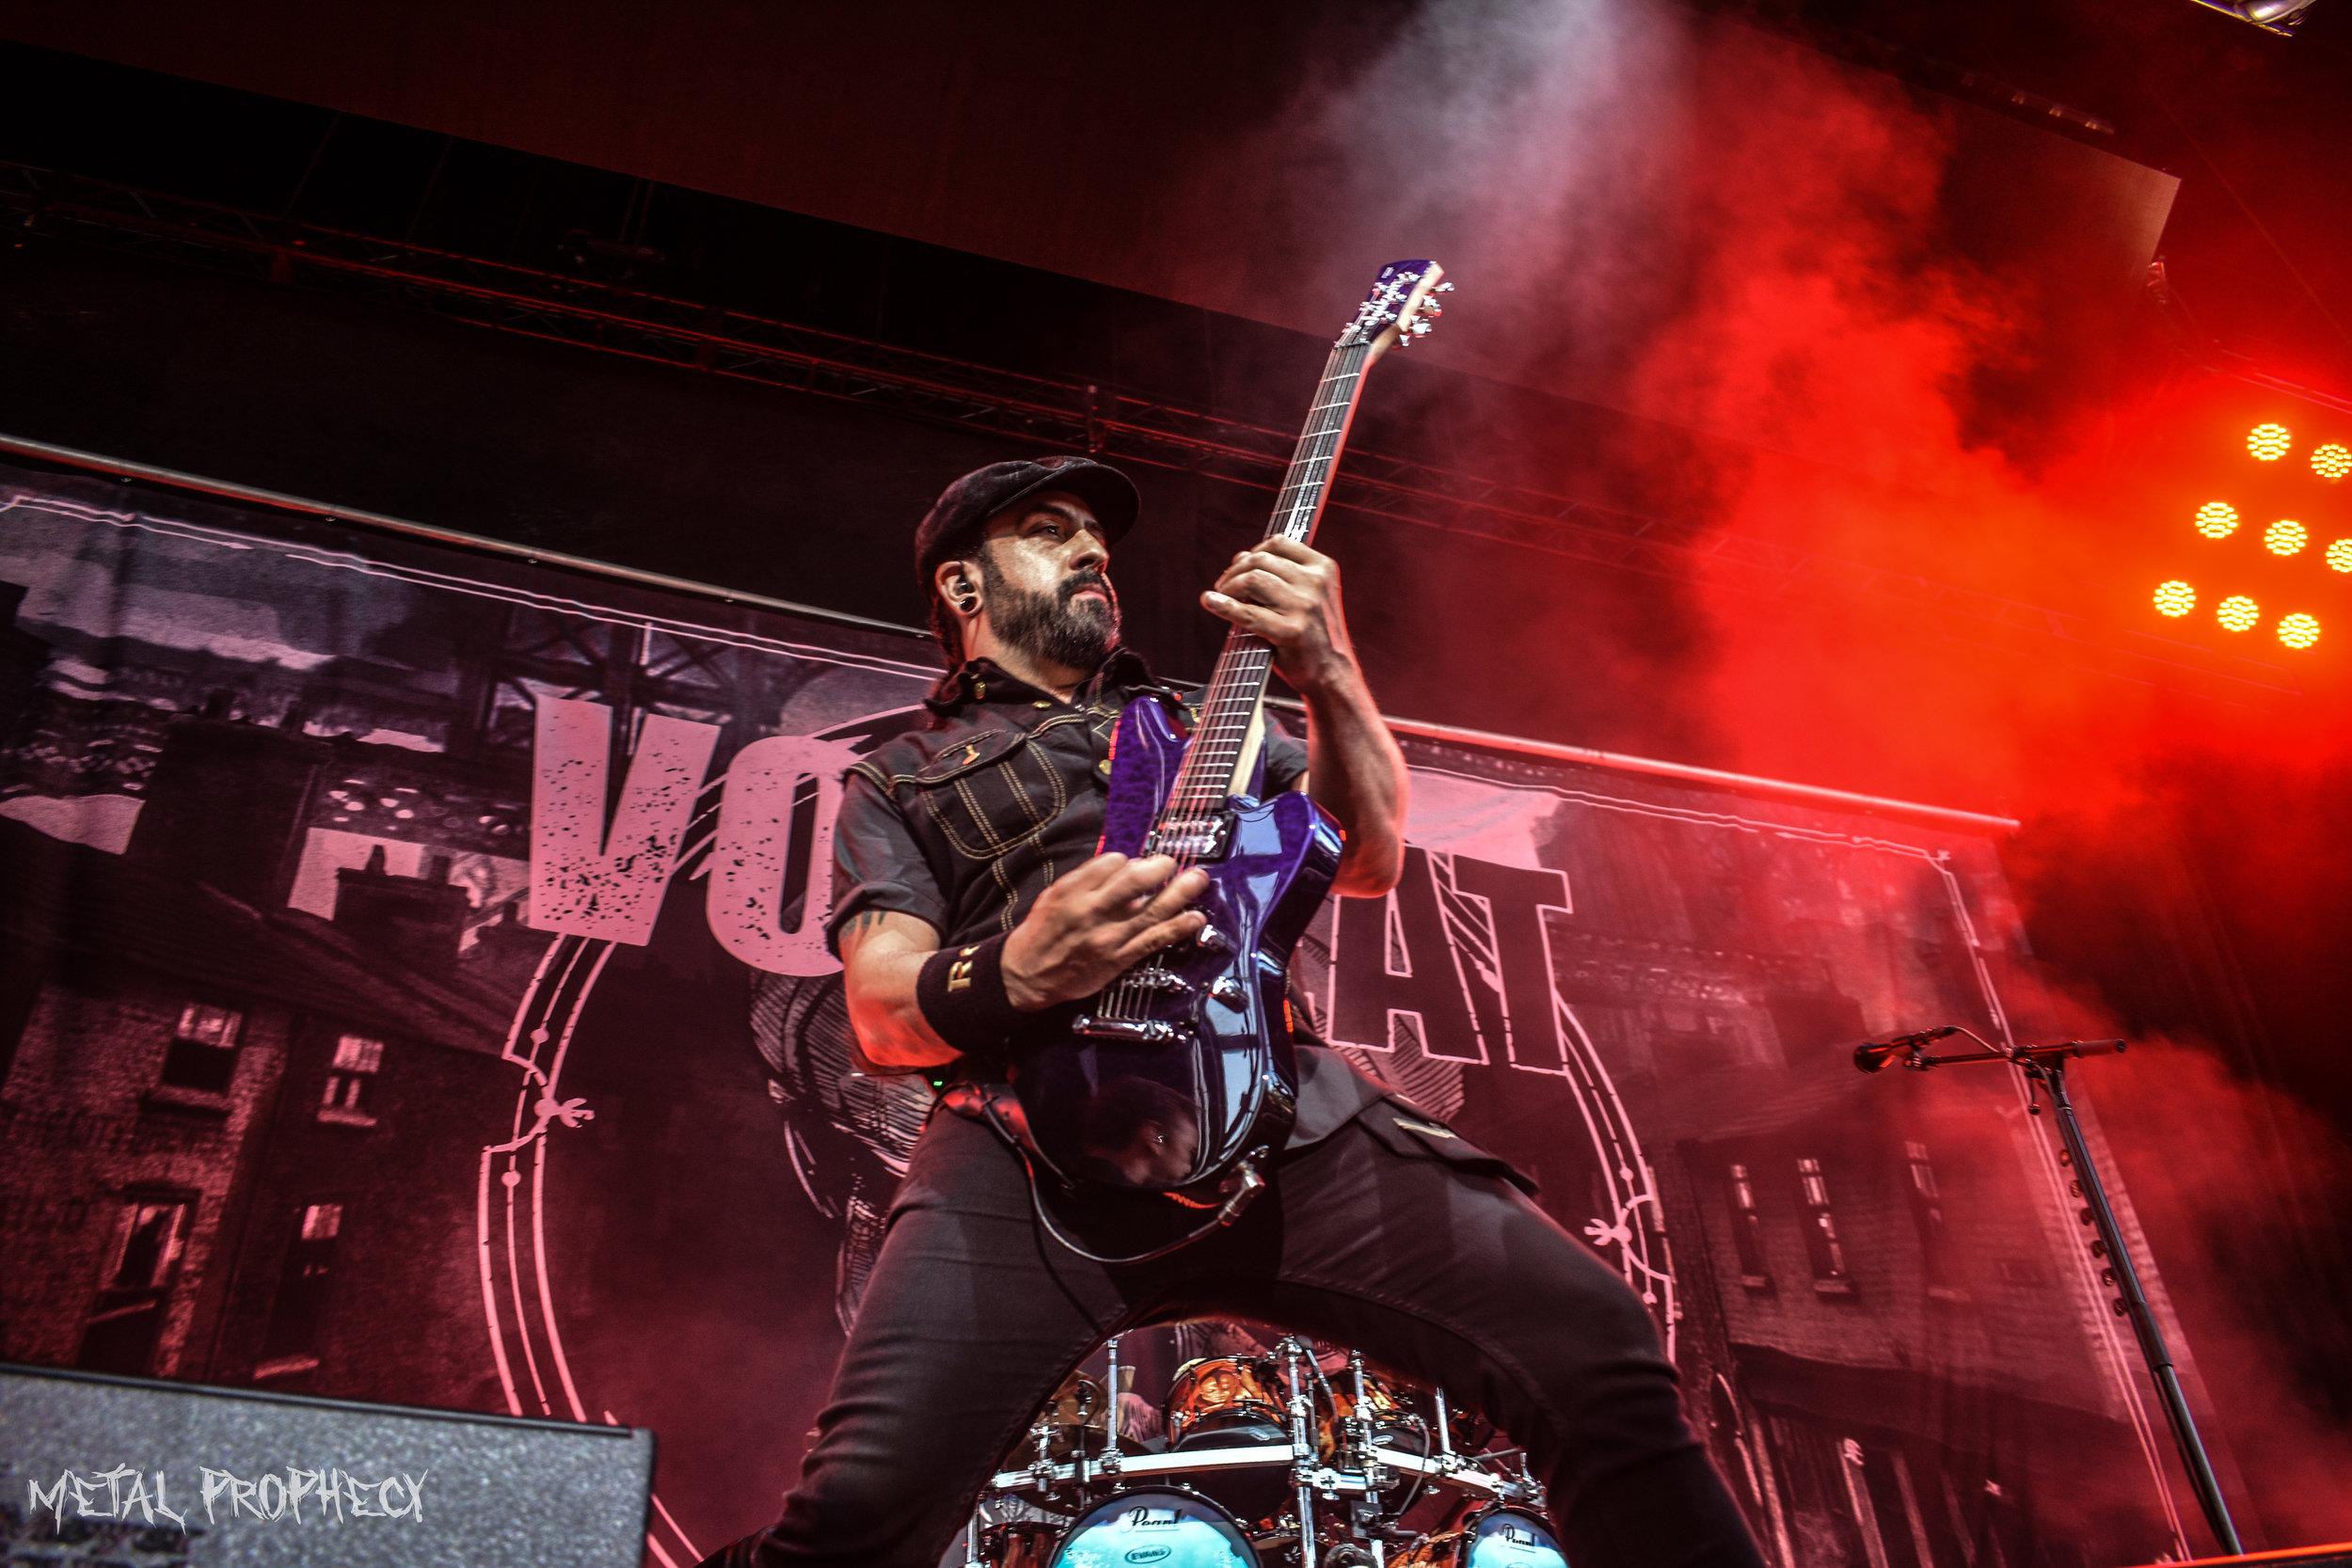 Volbeat at Ameris Bank Amphitheater